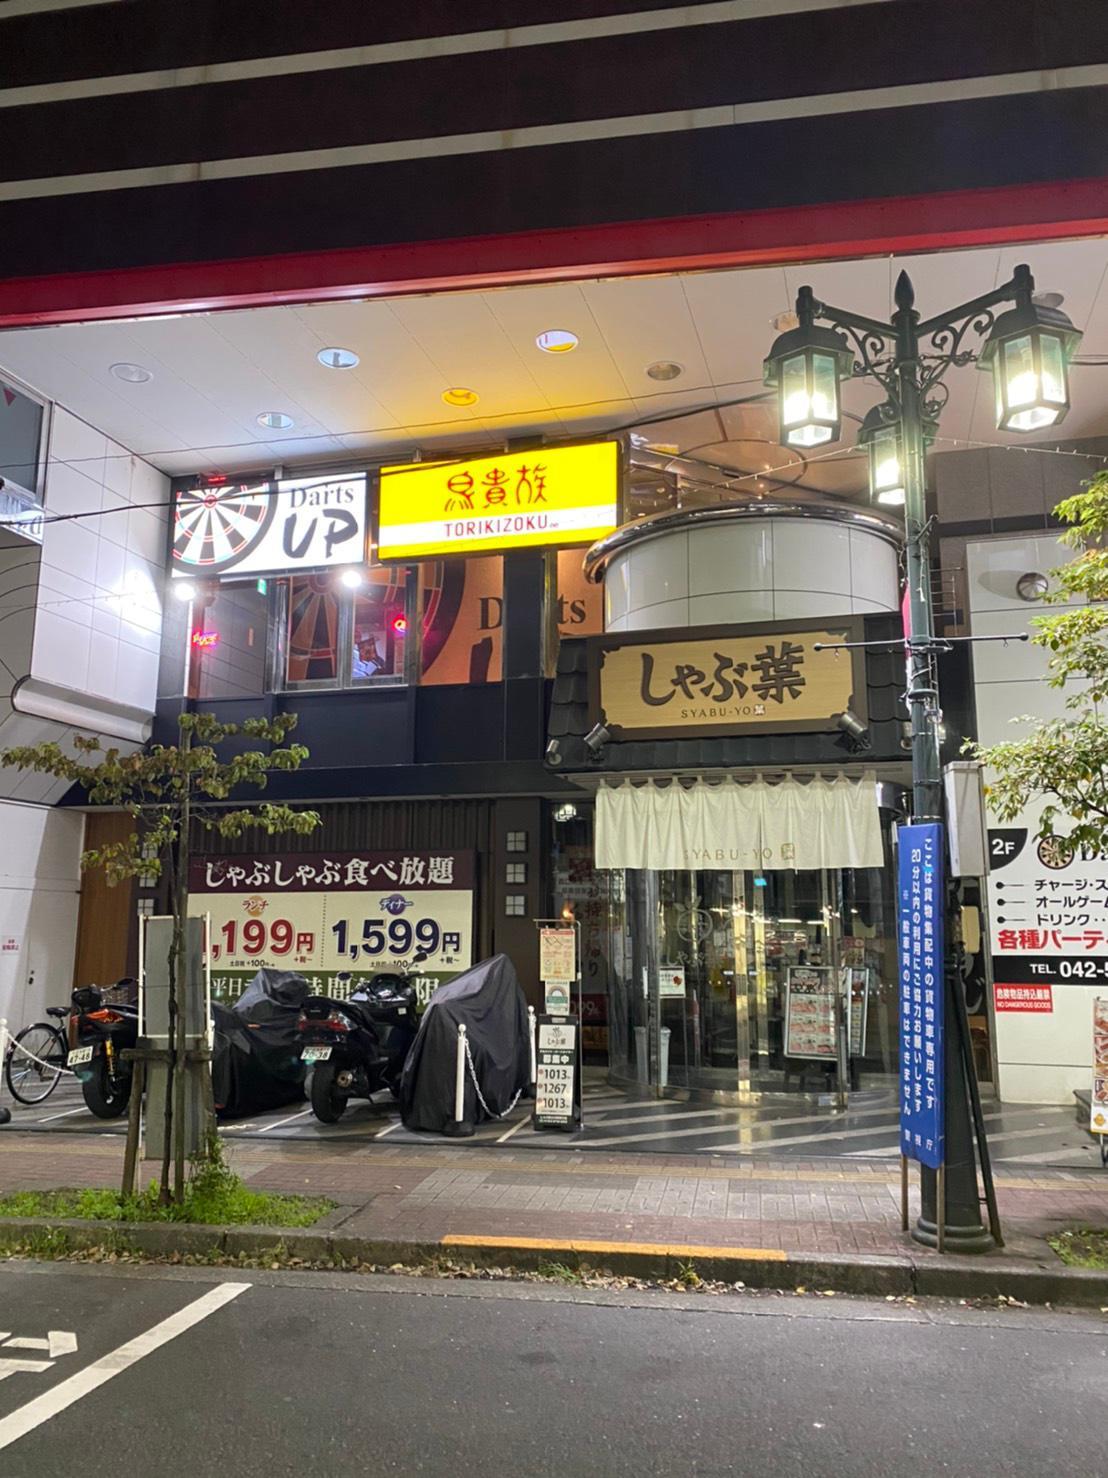 Darts UP立川店